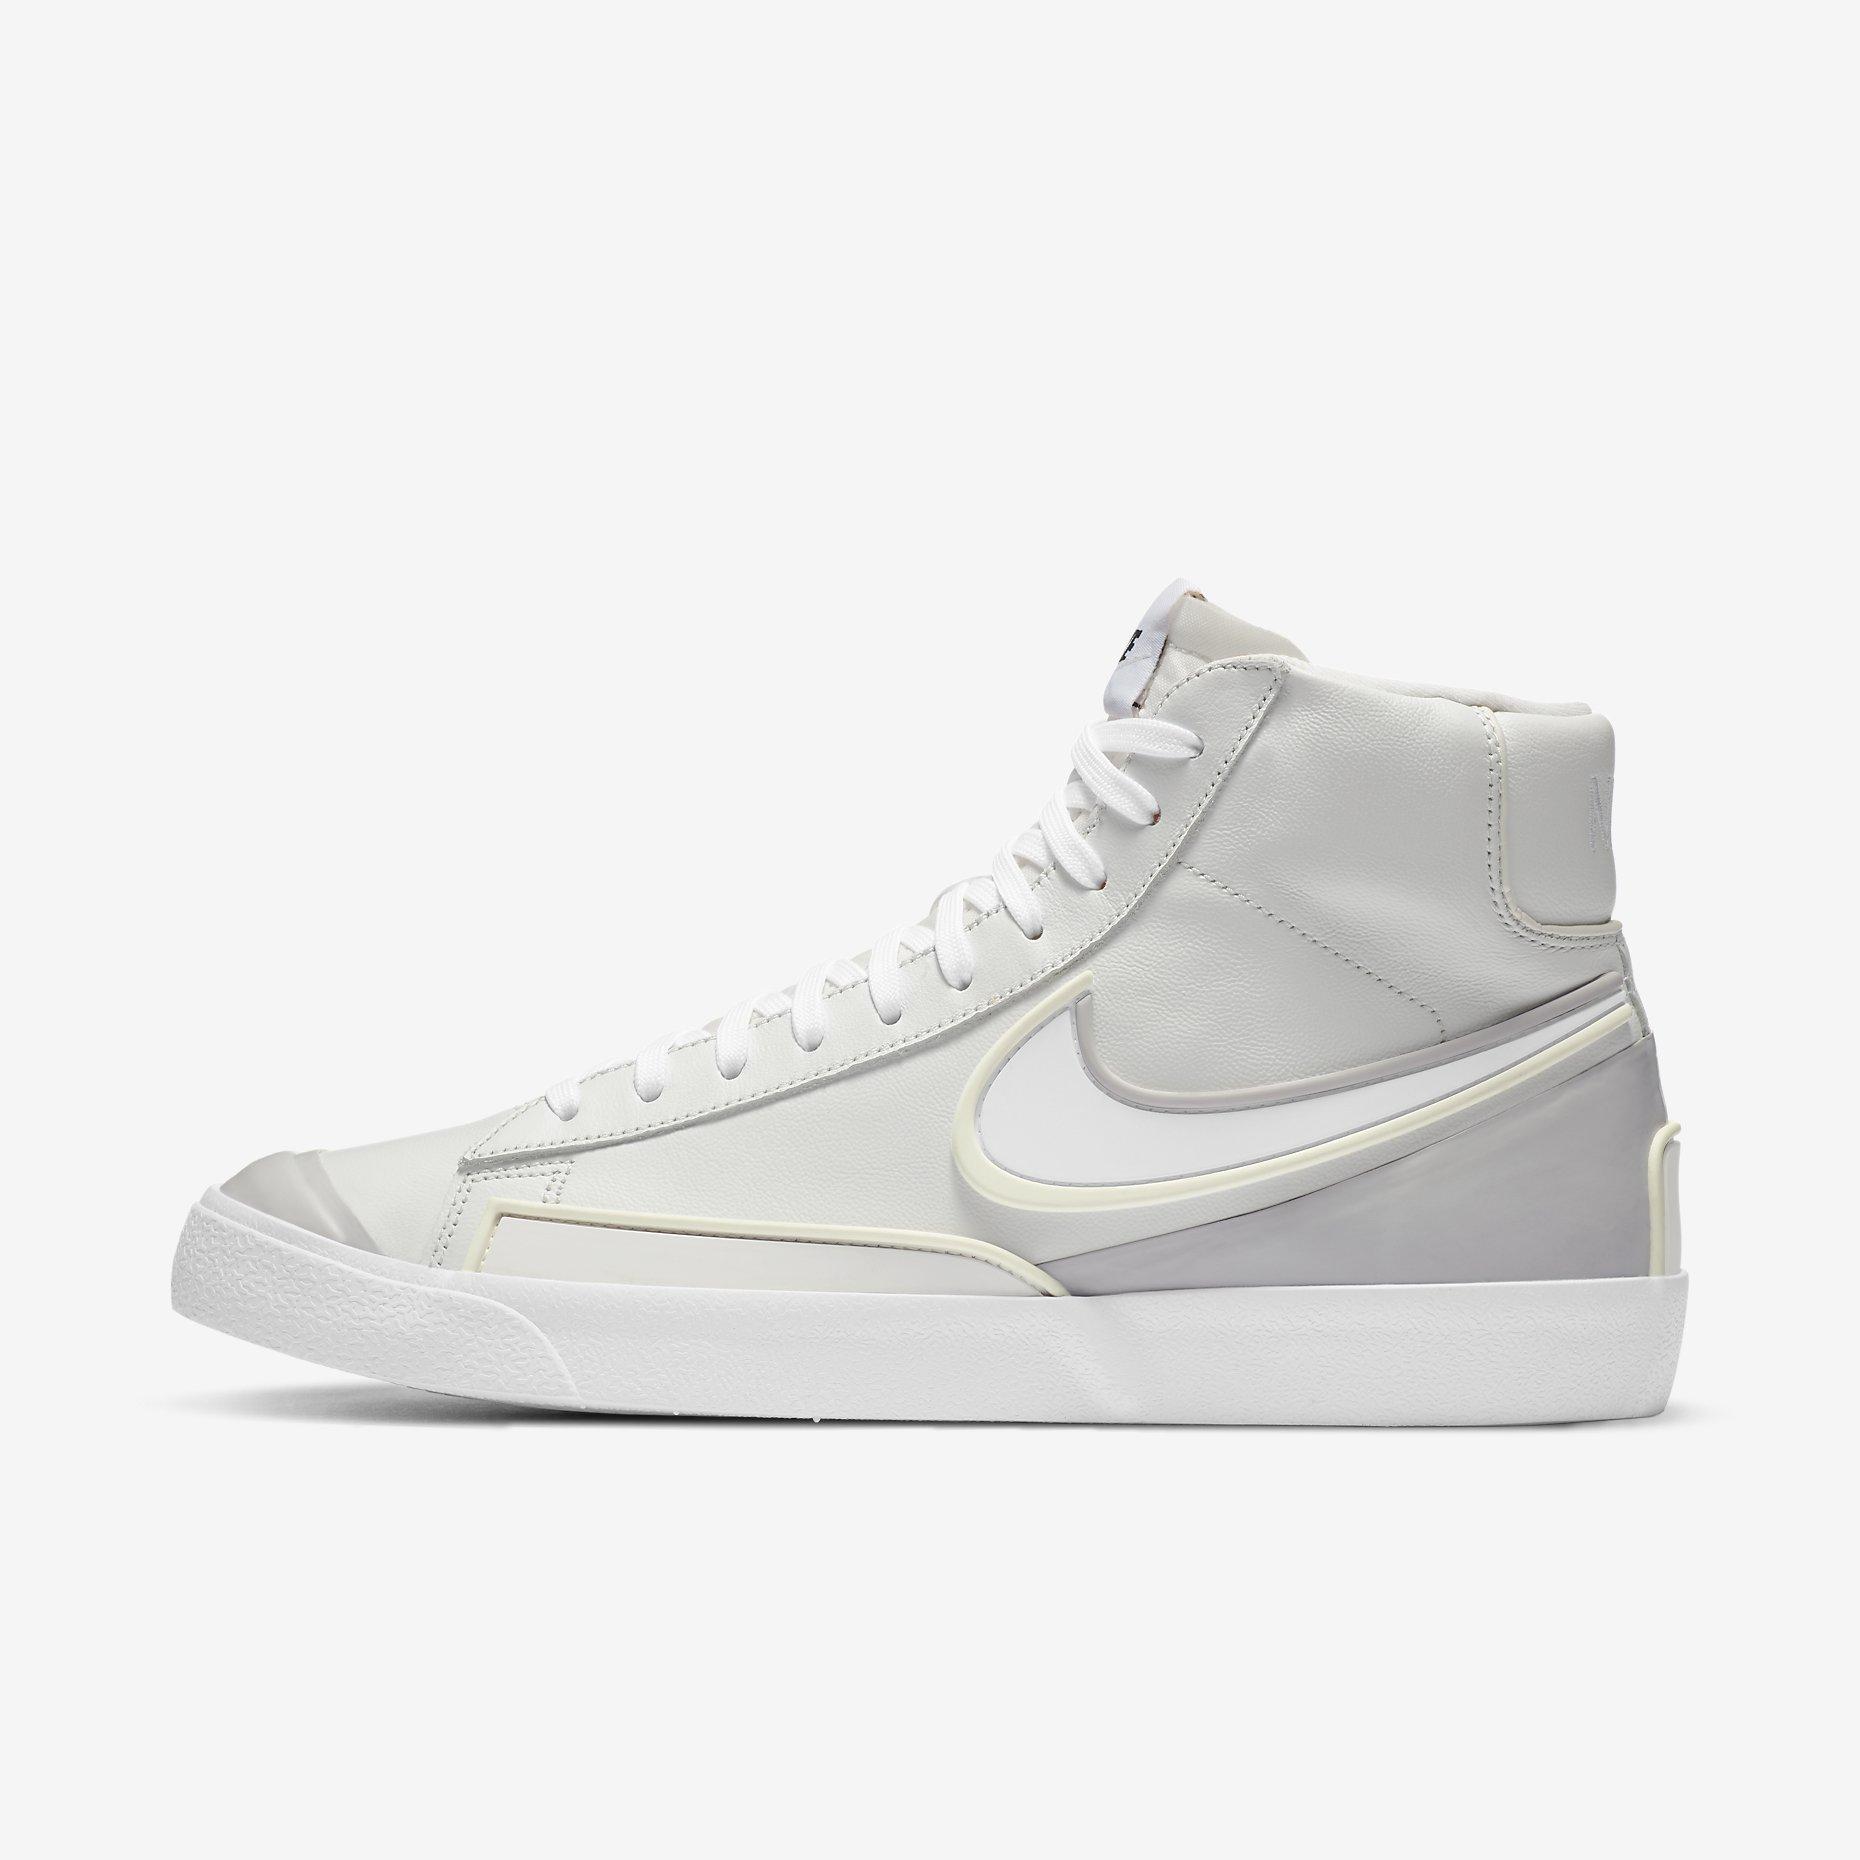 Nike Blazer Mid '77 Infinite 'Summit White/Sail'